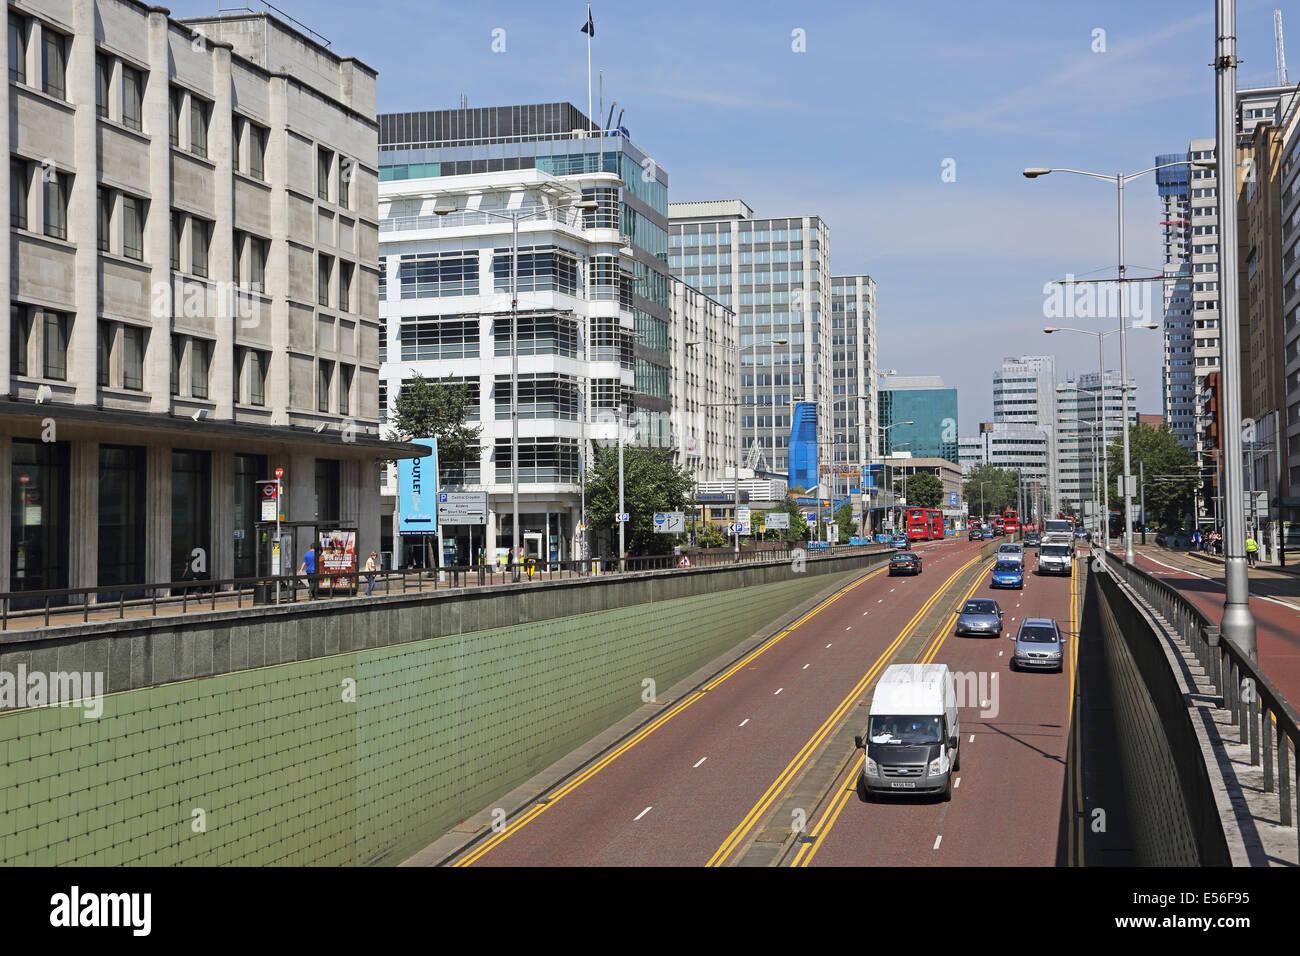 Road Planning Stockfotos & Road Planning Bilder - Alamy